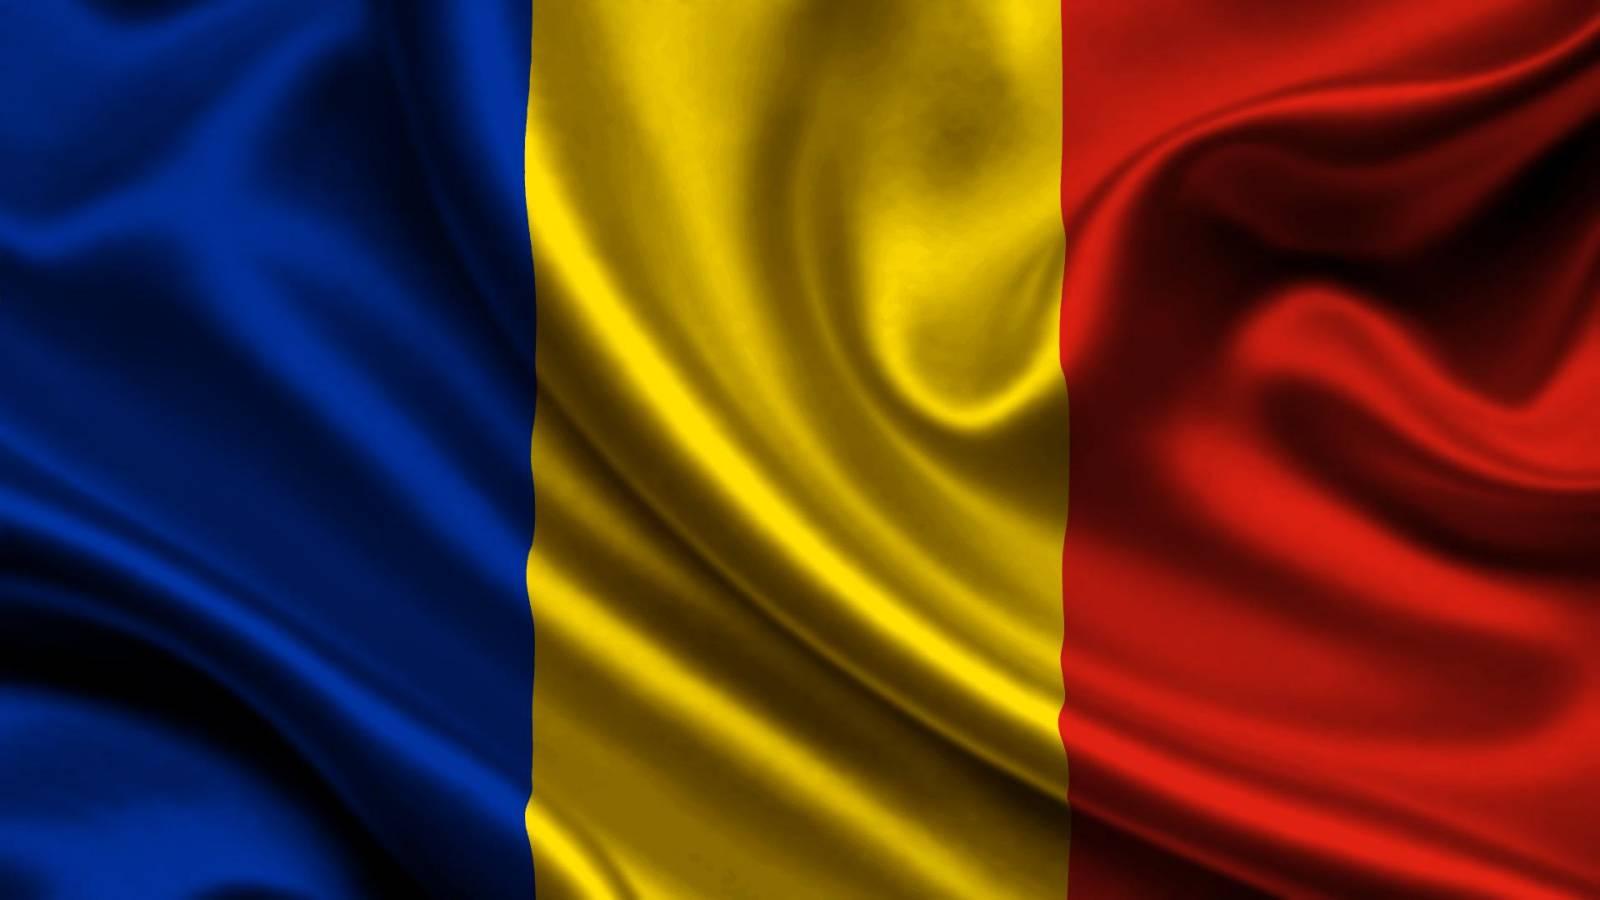 DSU Ce Trebuie sa faci Cutremur Romania VIDEO